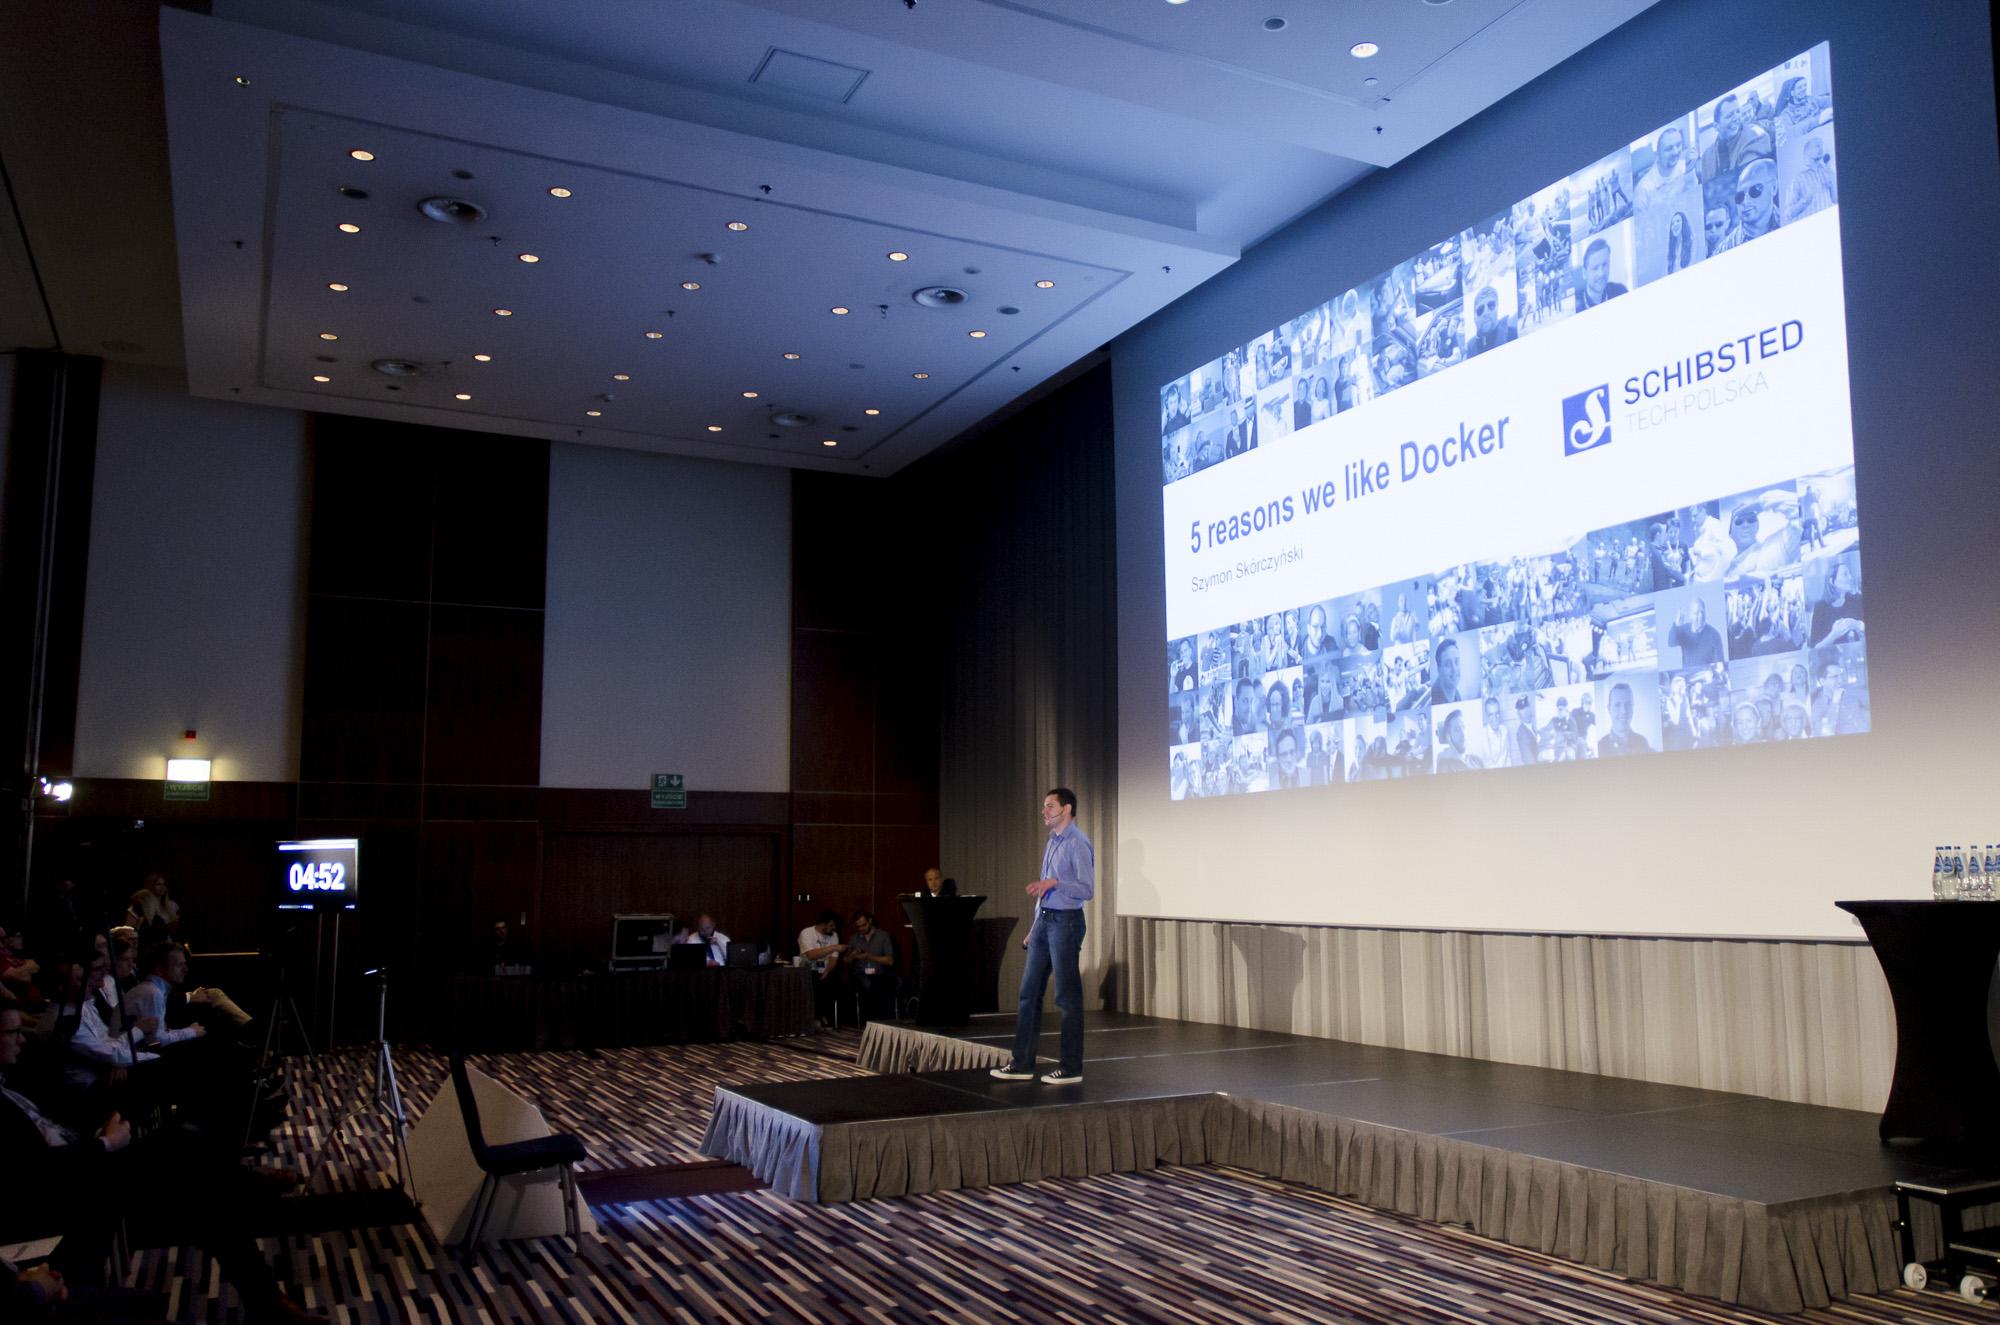 Team leader Szymon Skórczyński explained why Docker is used so much in Schibsted Tech Polska